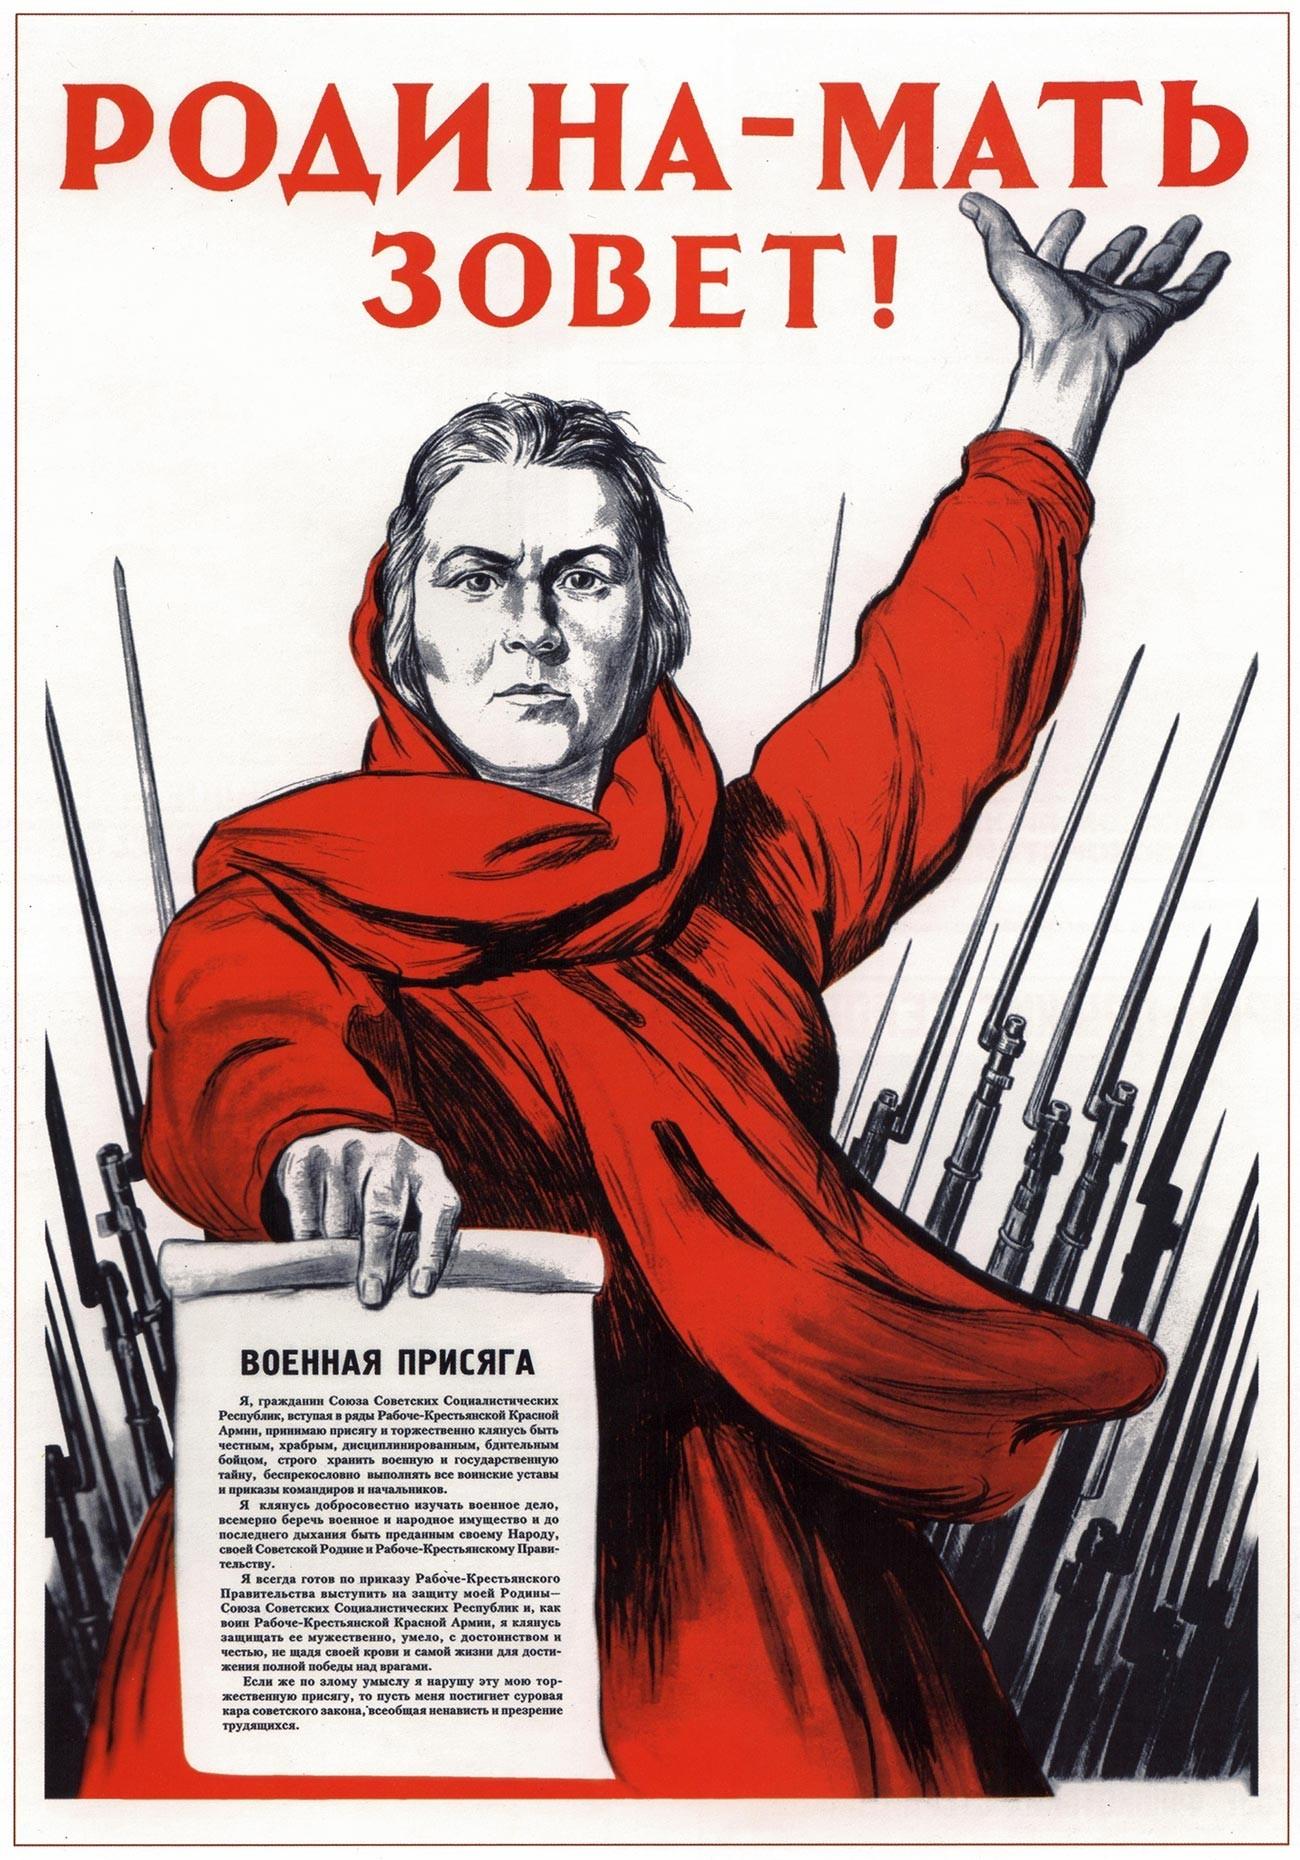 Cartel soviético 'La patria llama', 1941